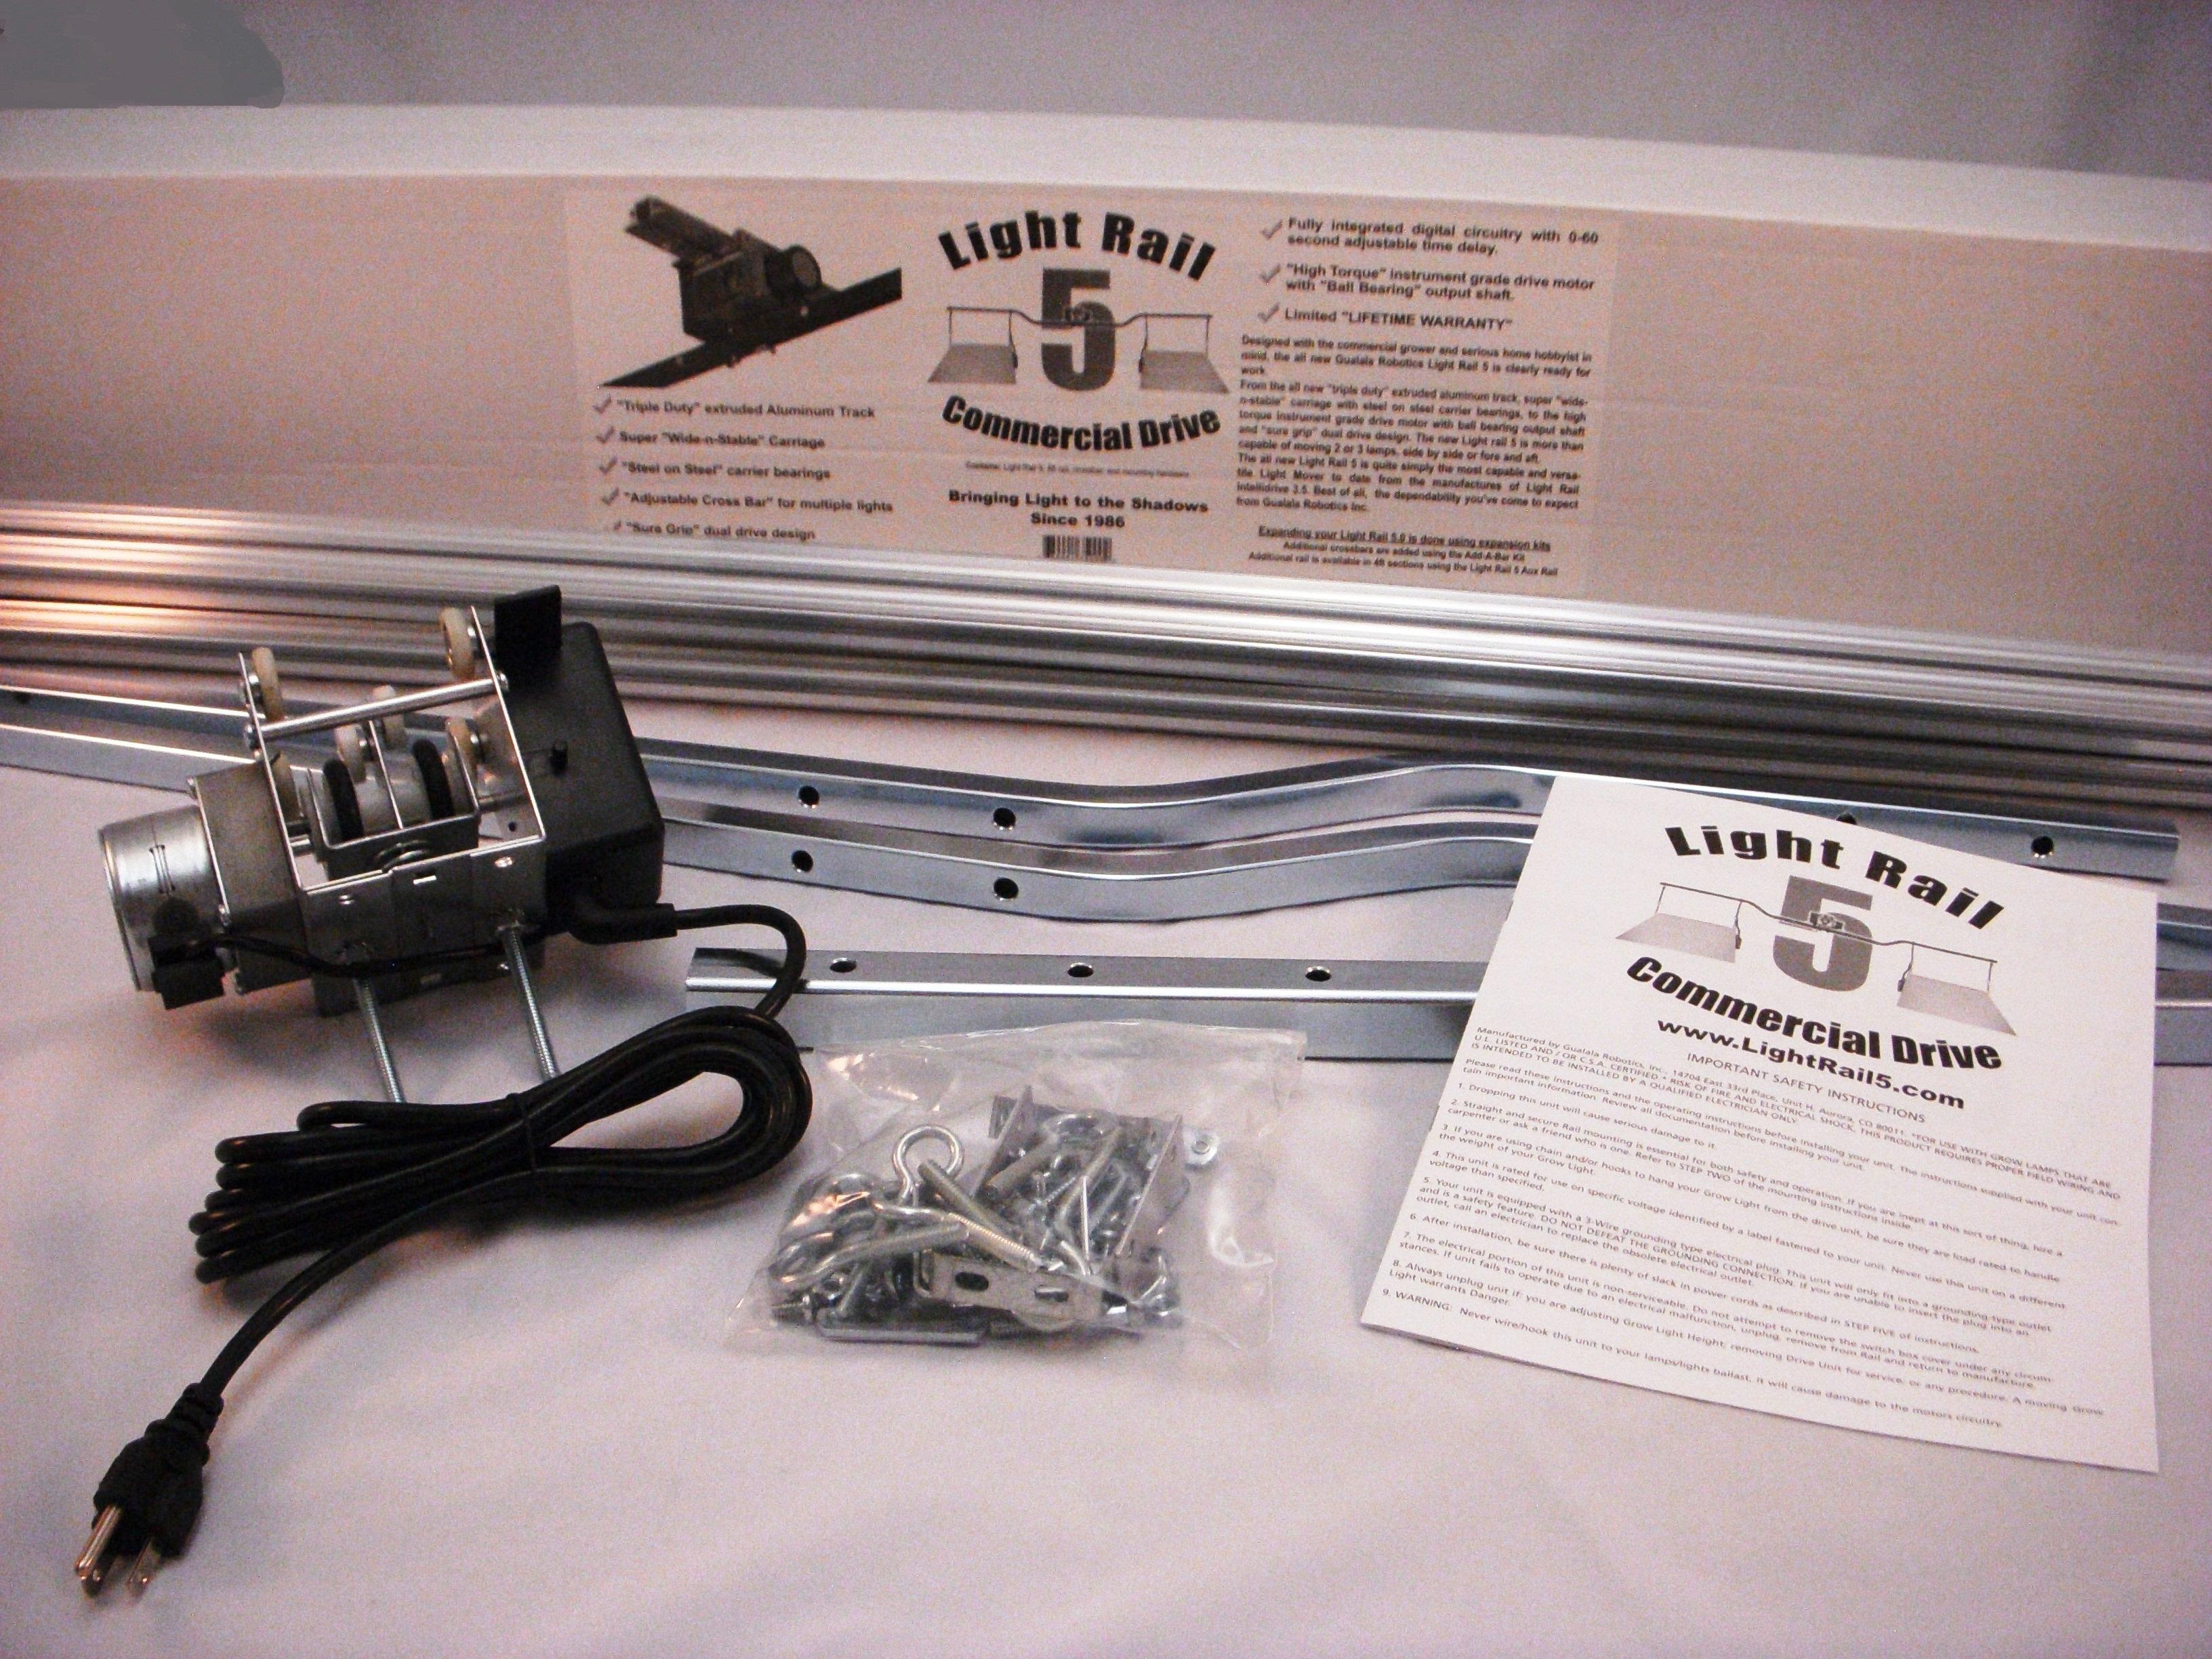 Light Rail 5 Motor Crossbar 8 Toledo Indoor Garden Home Wiring Outlet Height